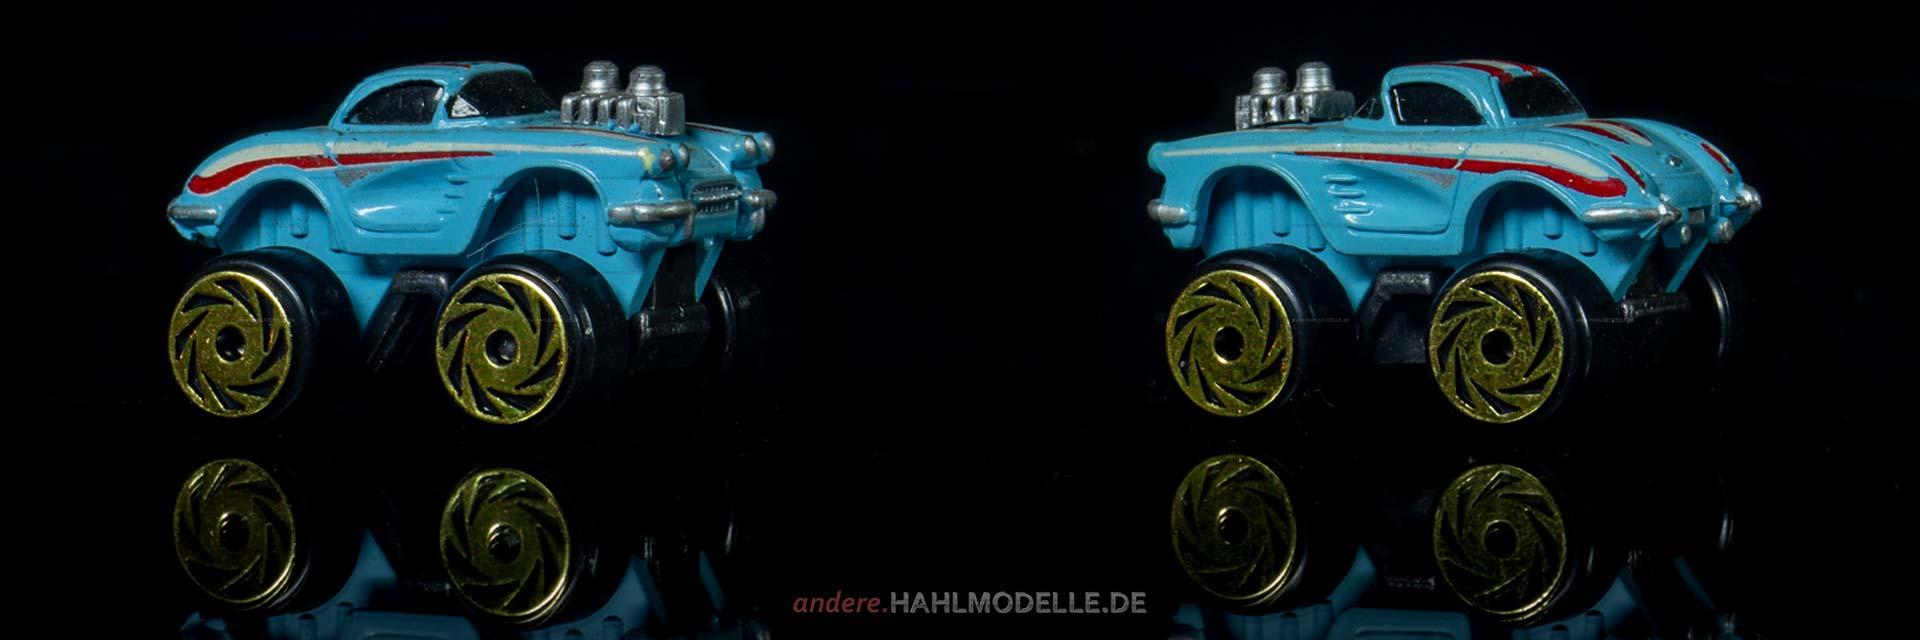 Chevrolet Corvette C1 | Roadster | Road Champs | ca. 1:150 | www.andere.hahlmodelle.de